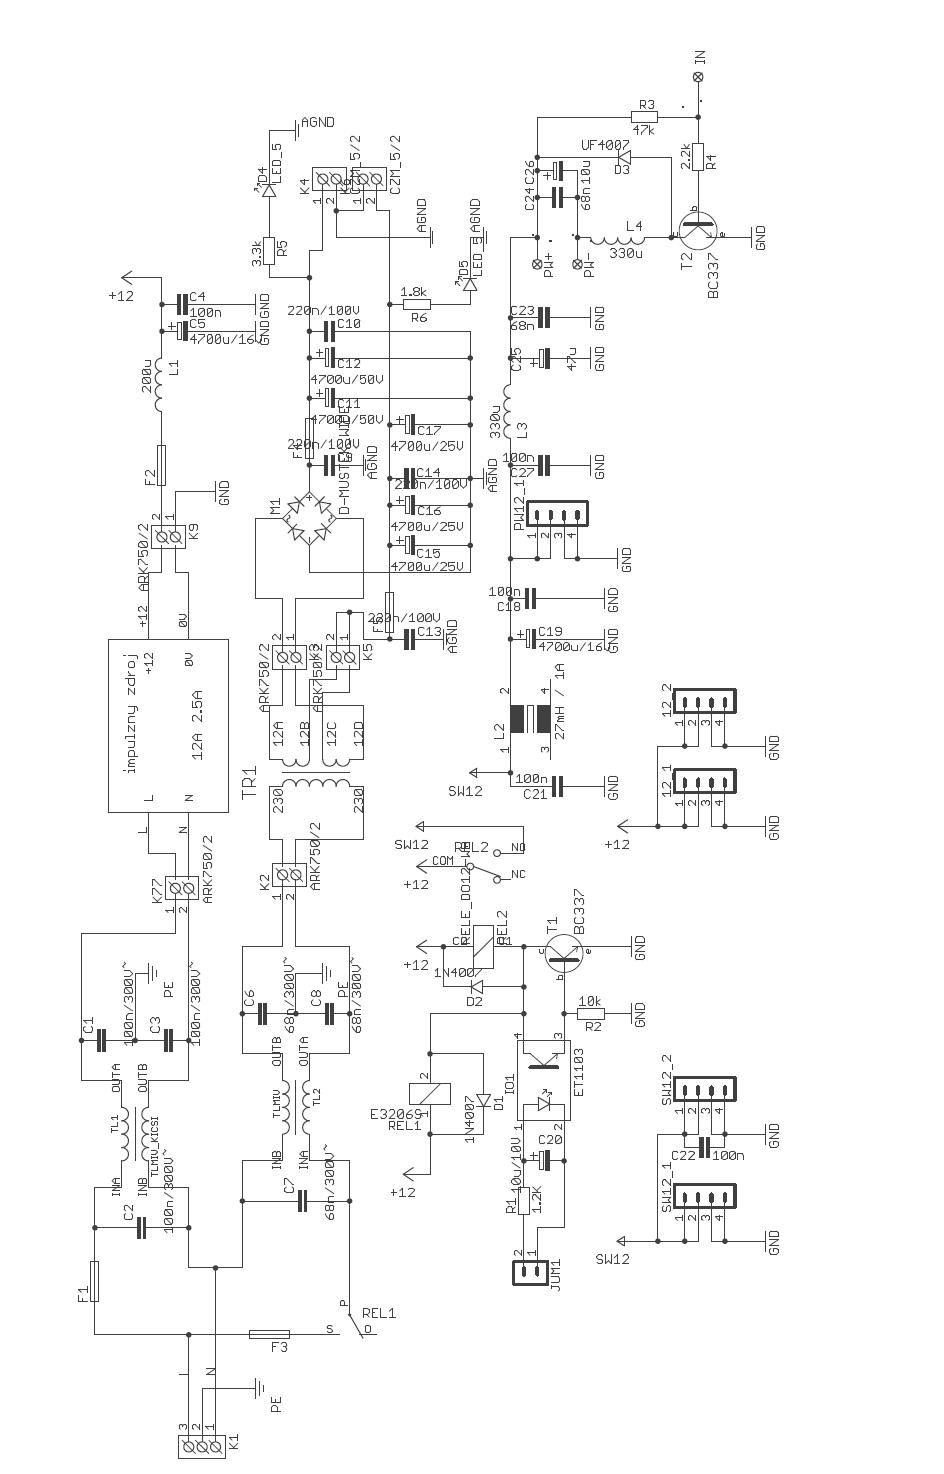 medium resolution of schematic circuit tas5706a amplifier pulse width modulation pwm pcm1850a diagram 120x120 digital class d amplifier circuit